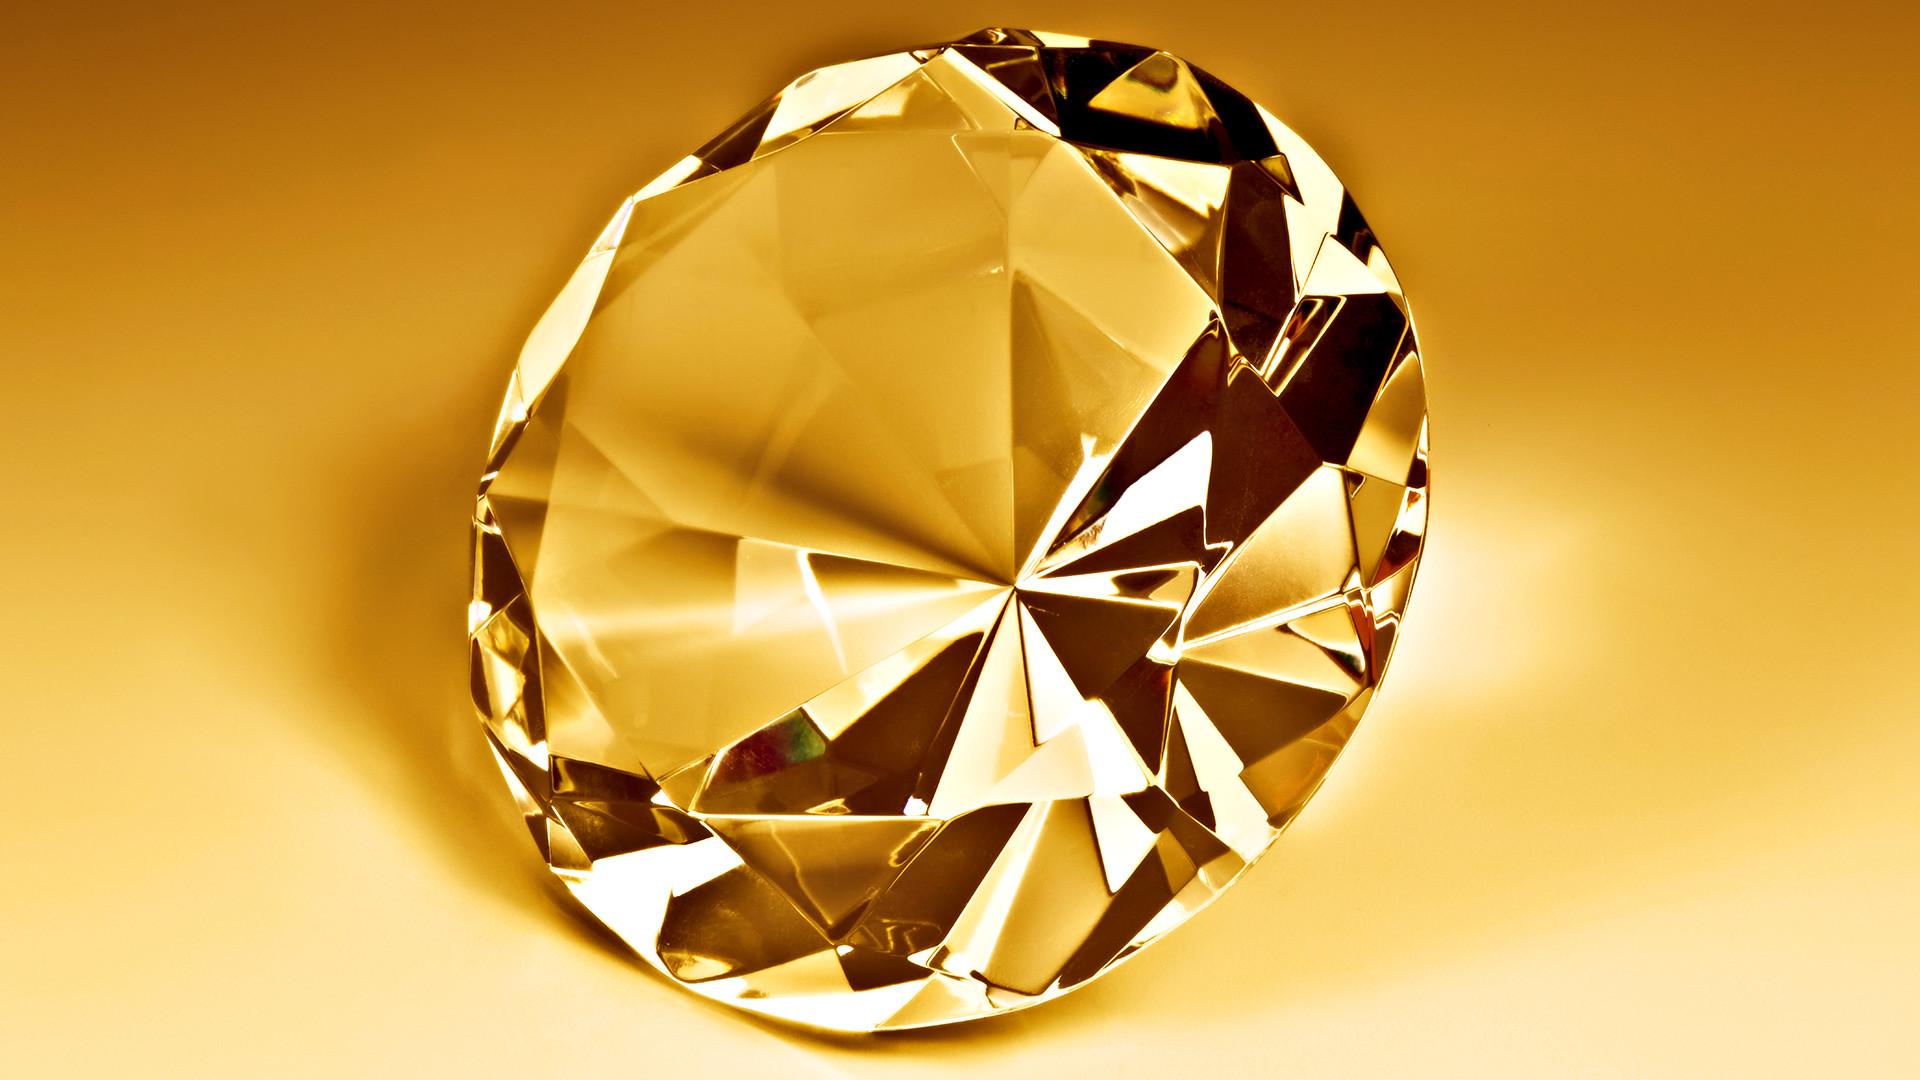 Res: 1920x1080, Gold Diamond Wallpaper 48967